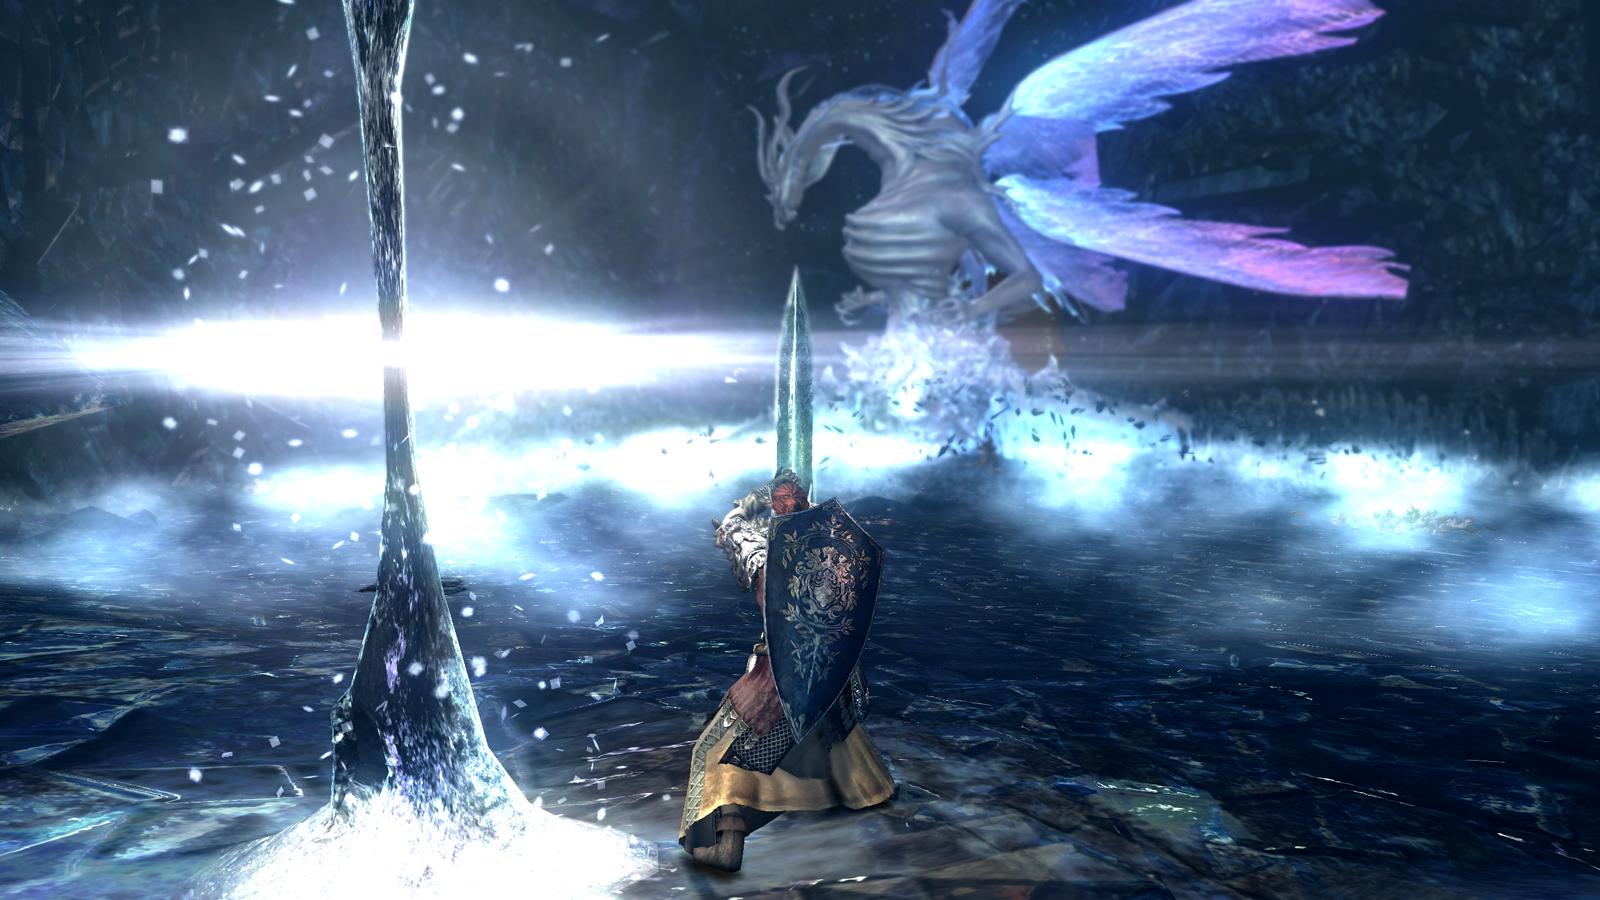 Улучшаем графику в Dark Souls Prepare to Die Edtiton